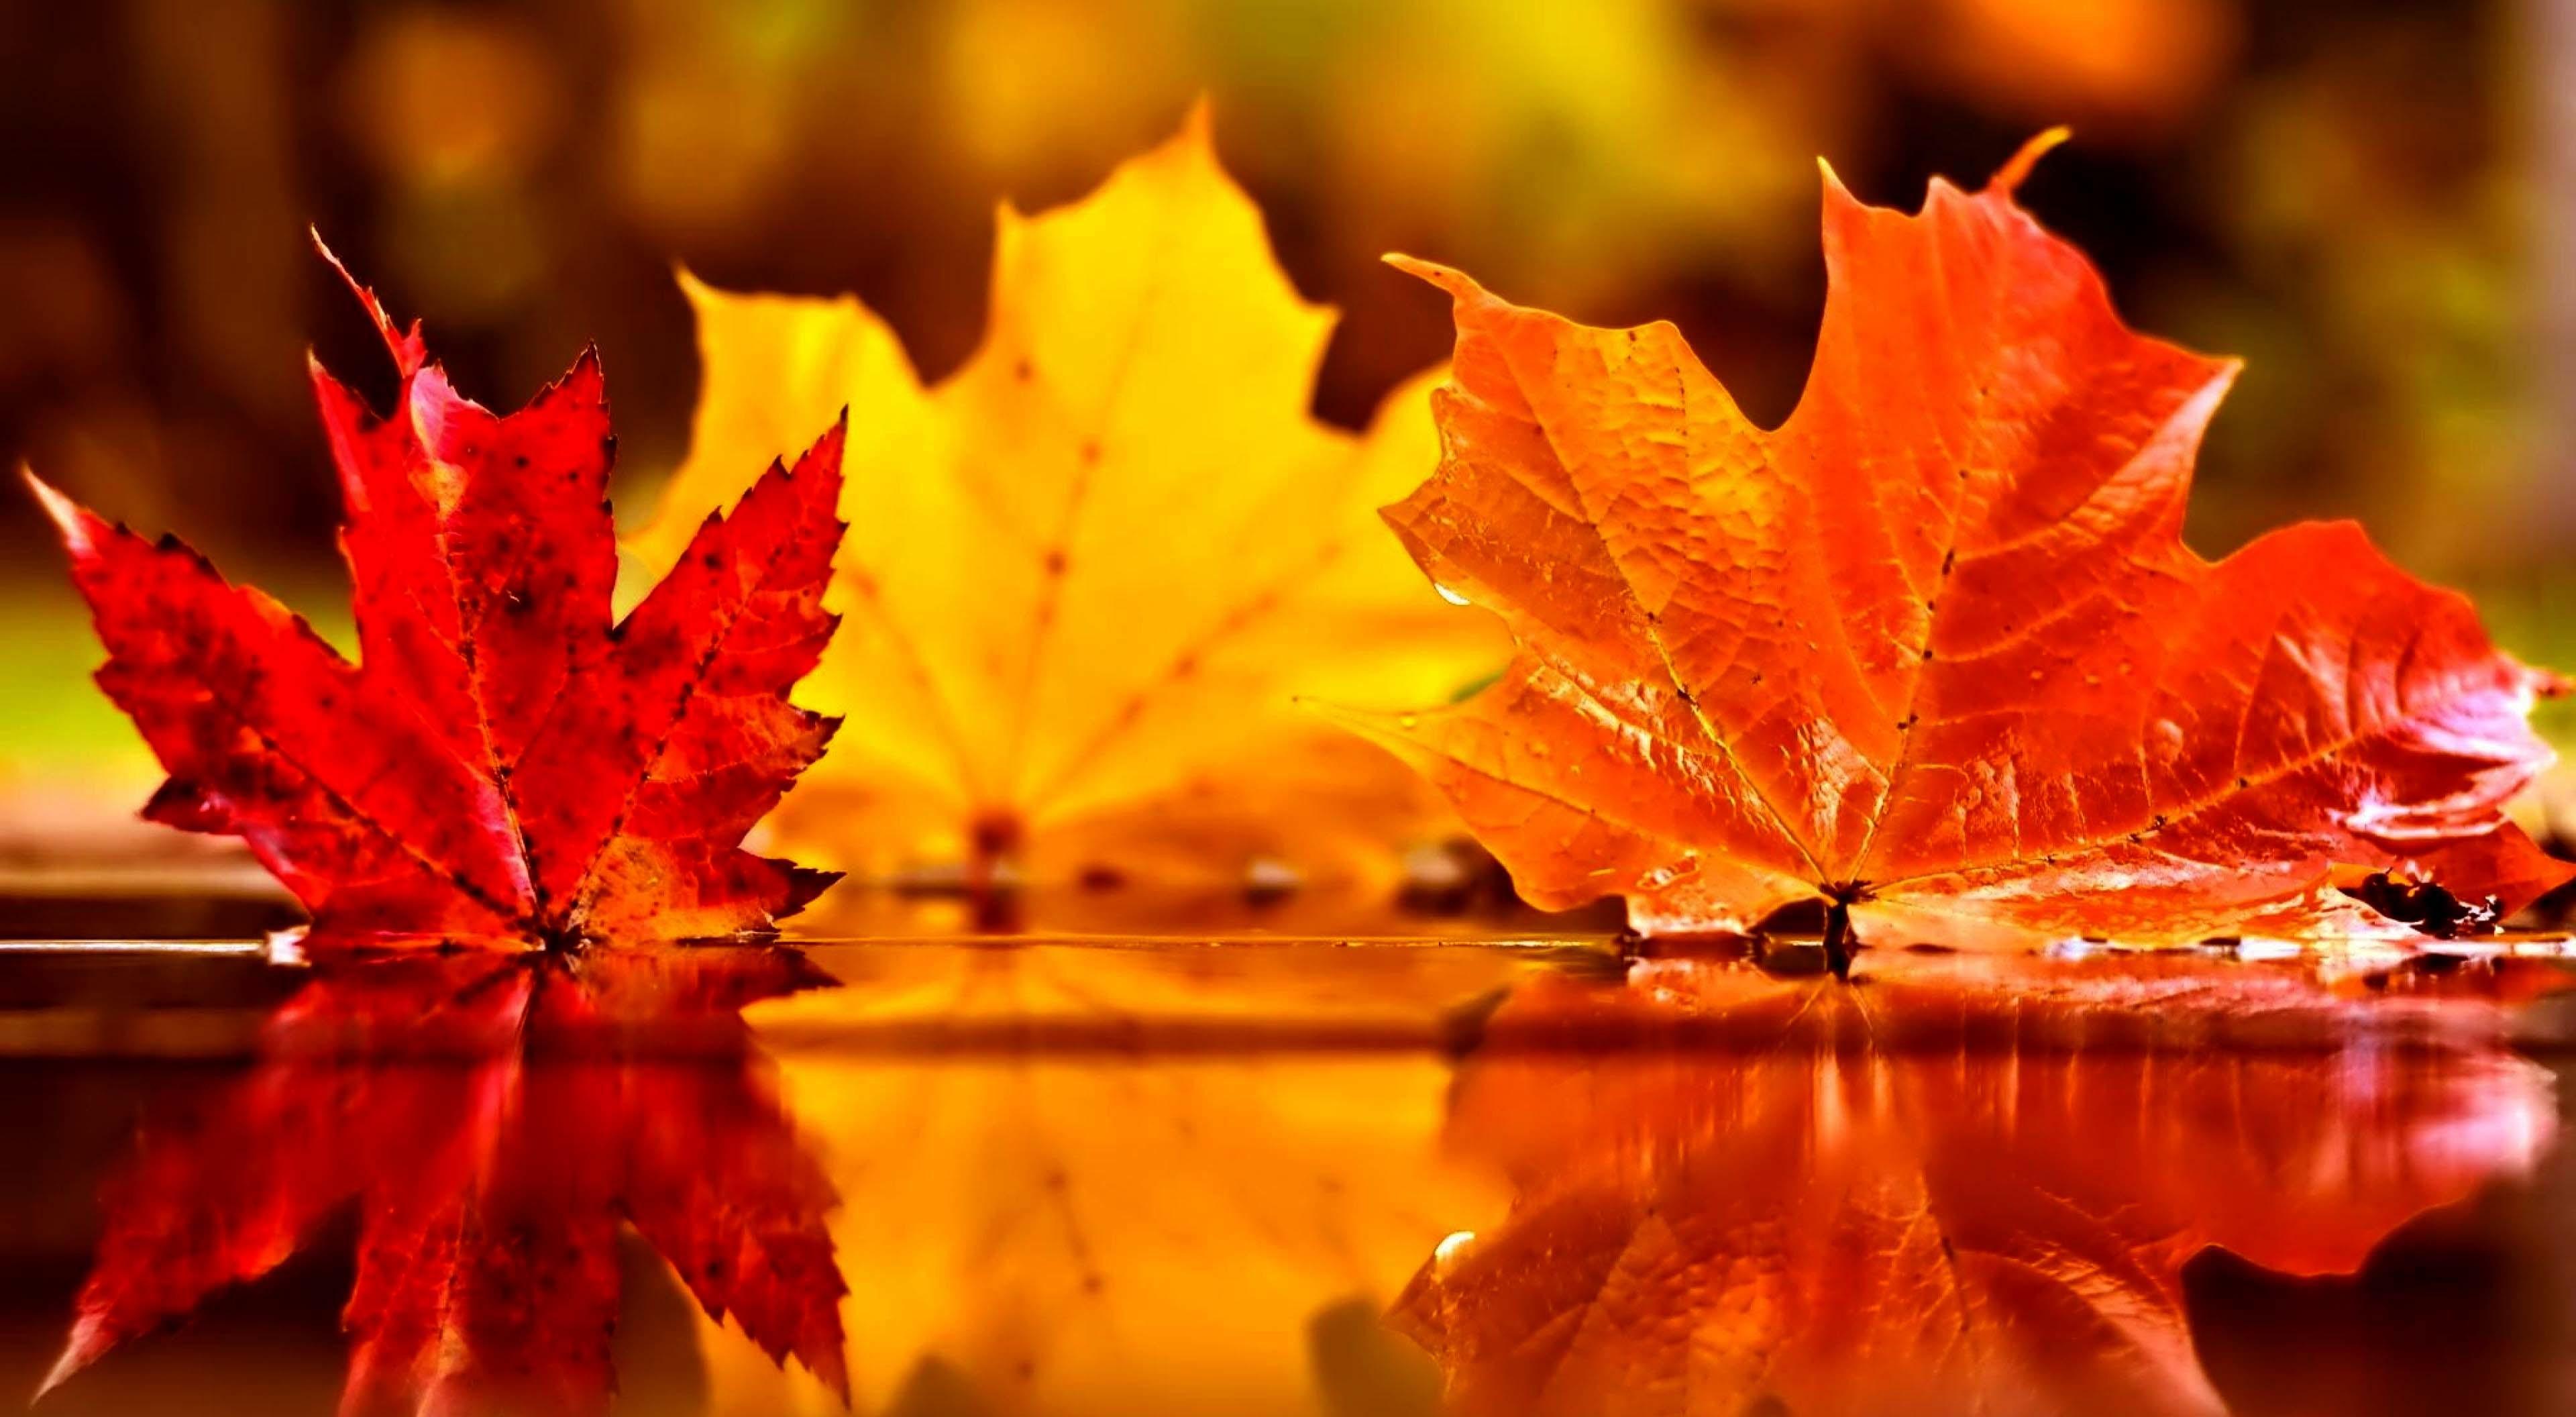 Autumn Leaf Wallpaper (68+ images)